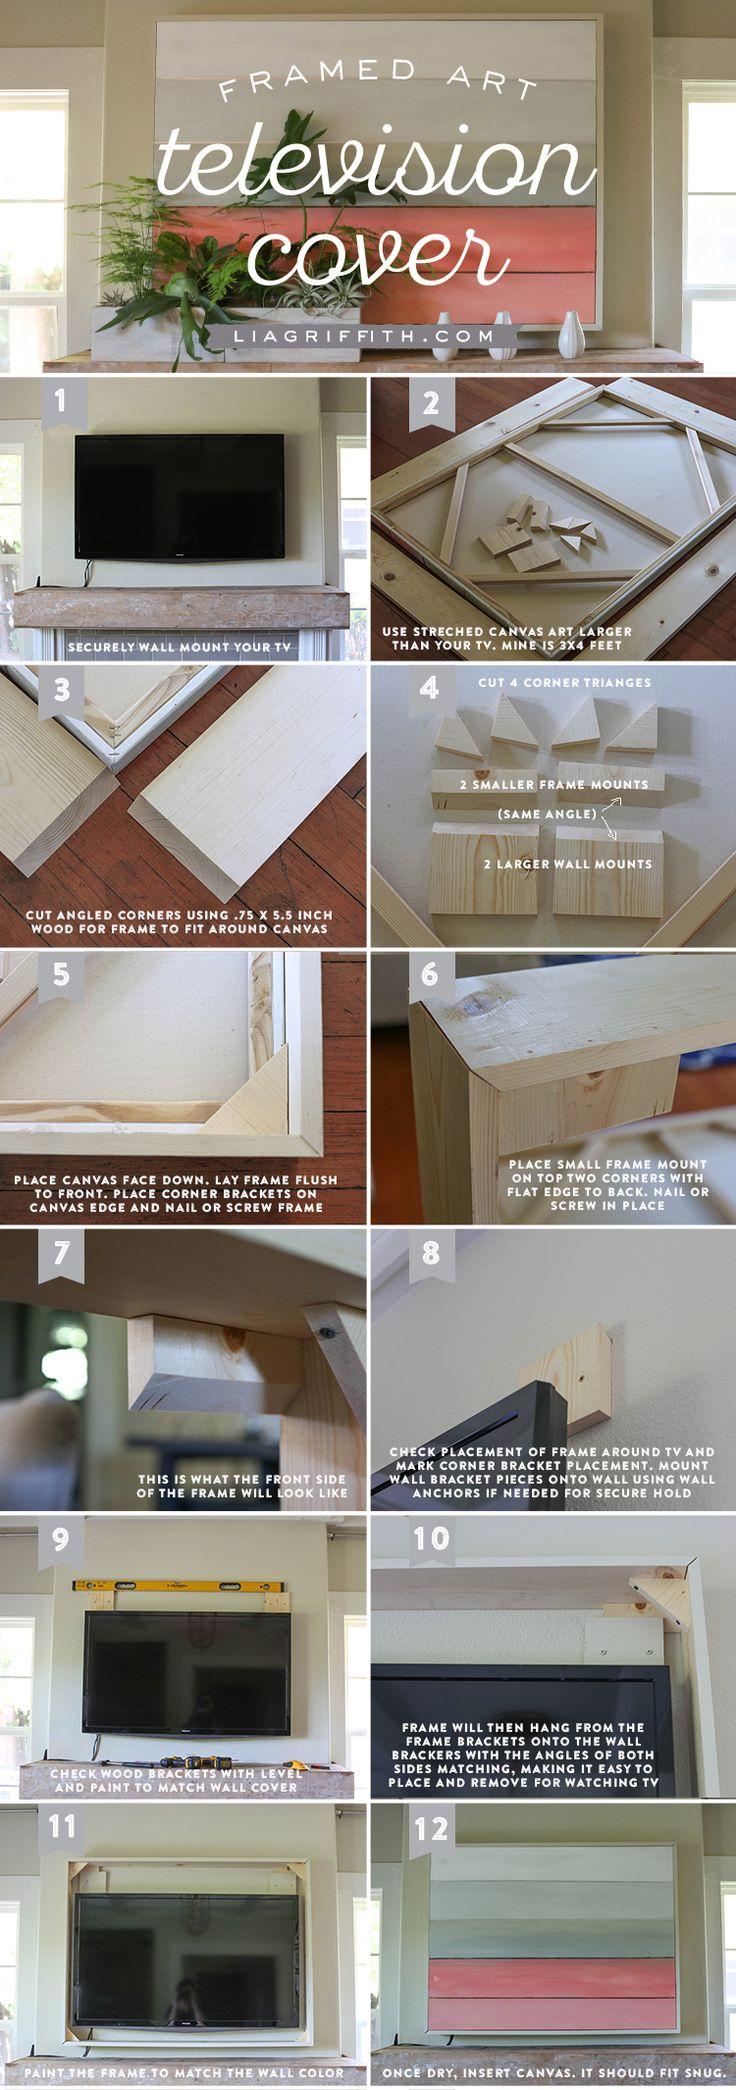 Best 25+ Tv frames ideas on Pinterest | Beige framed mirrors, Home tvs and  Clean flat screen tv